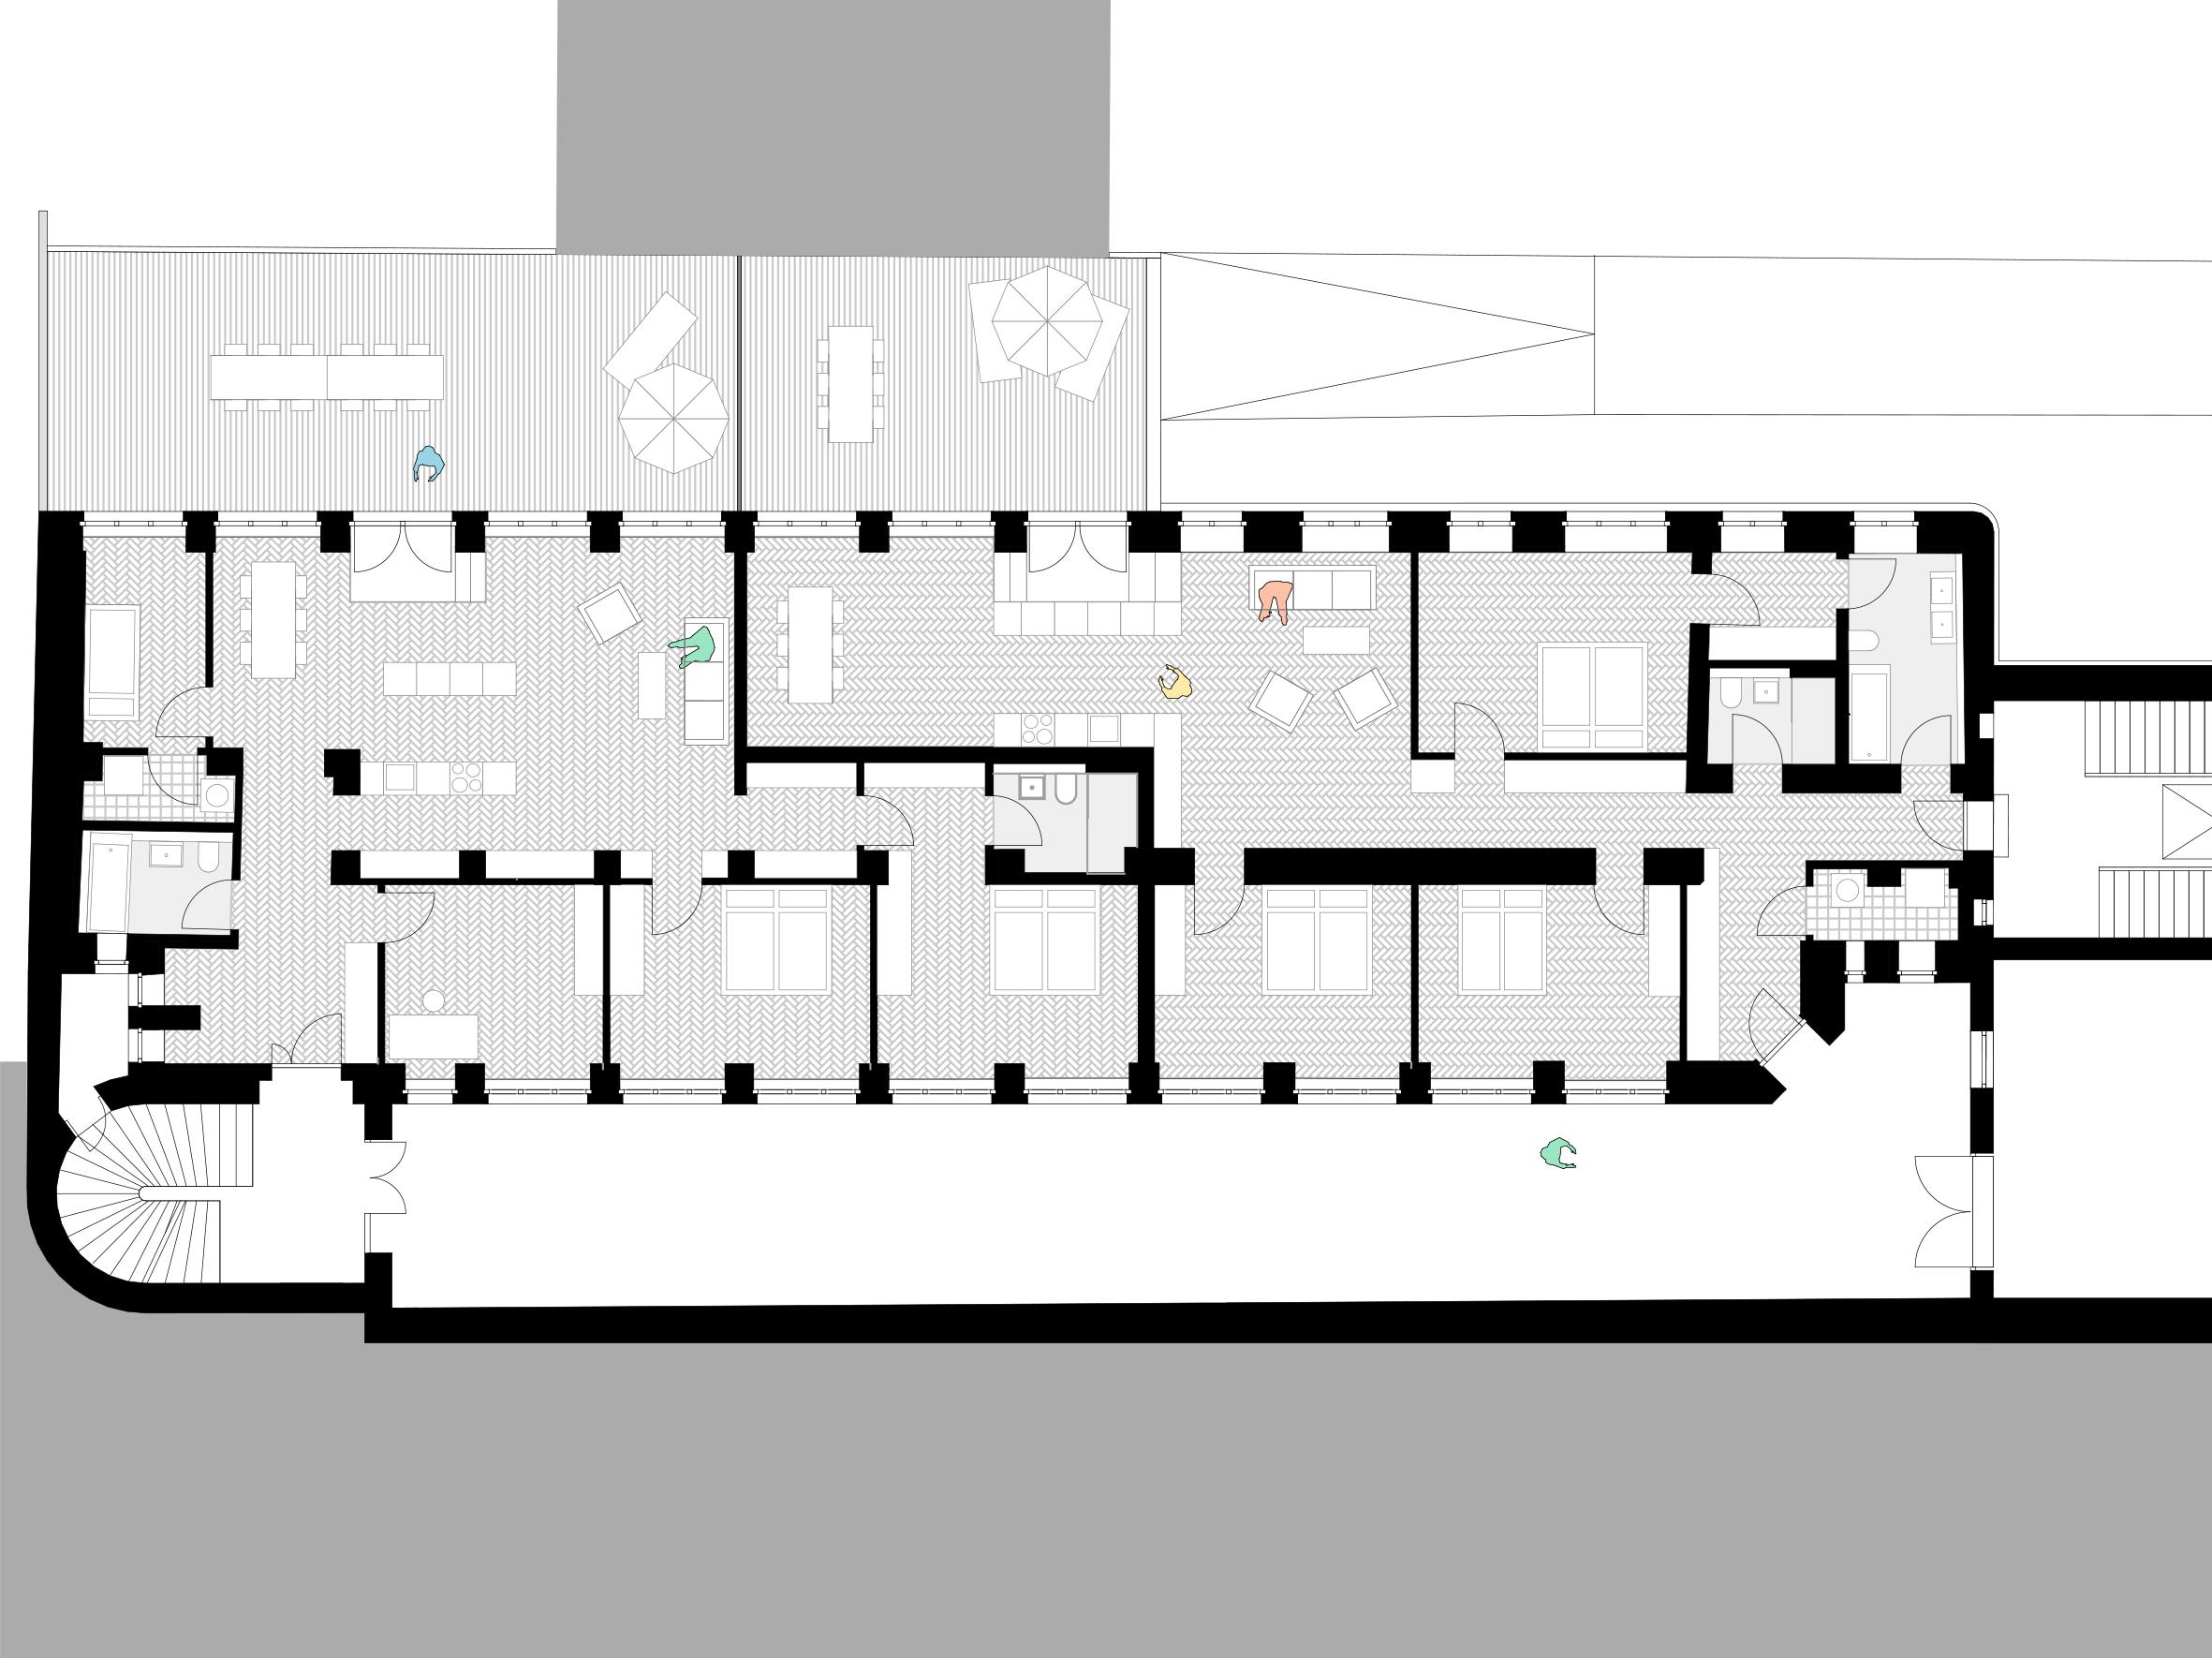 Sg65 grundriss neu web 15 x 20